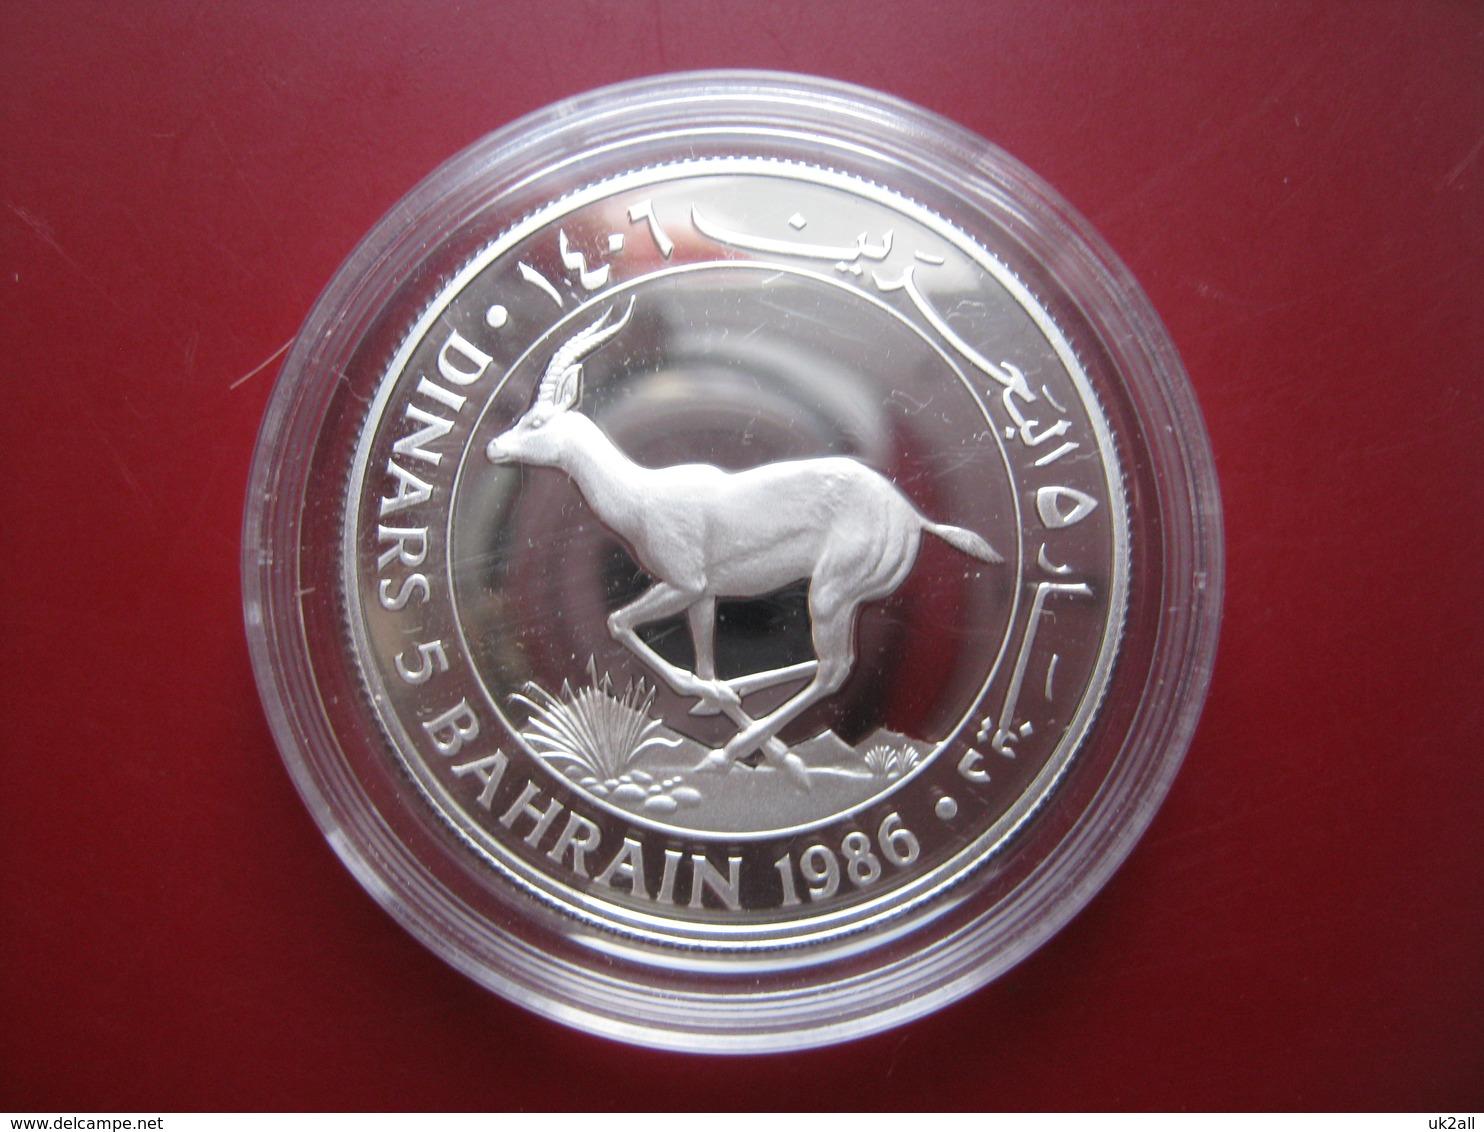 Bahrain 1986 5 Dinars Silver Proof Coin WWF With COA Card - Rhim Gazelle - Bahrain